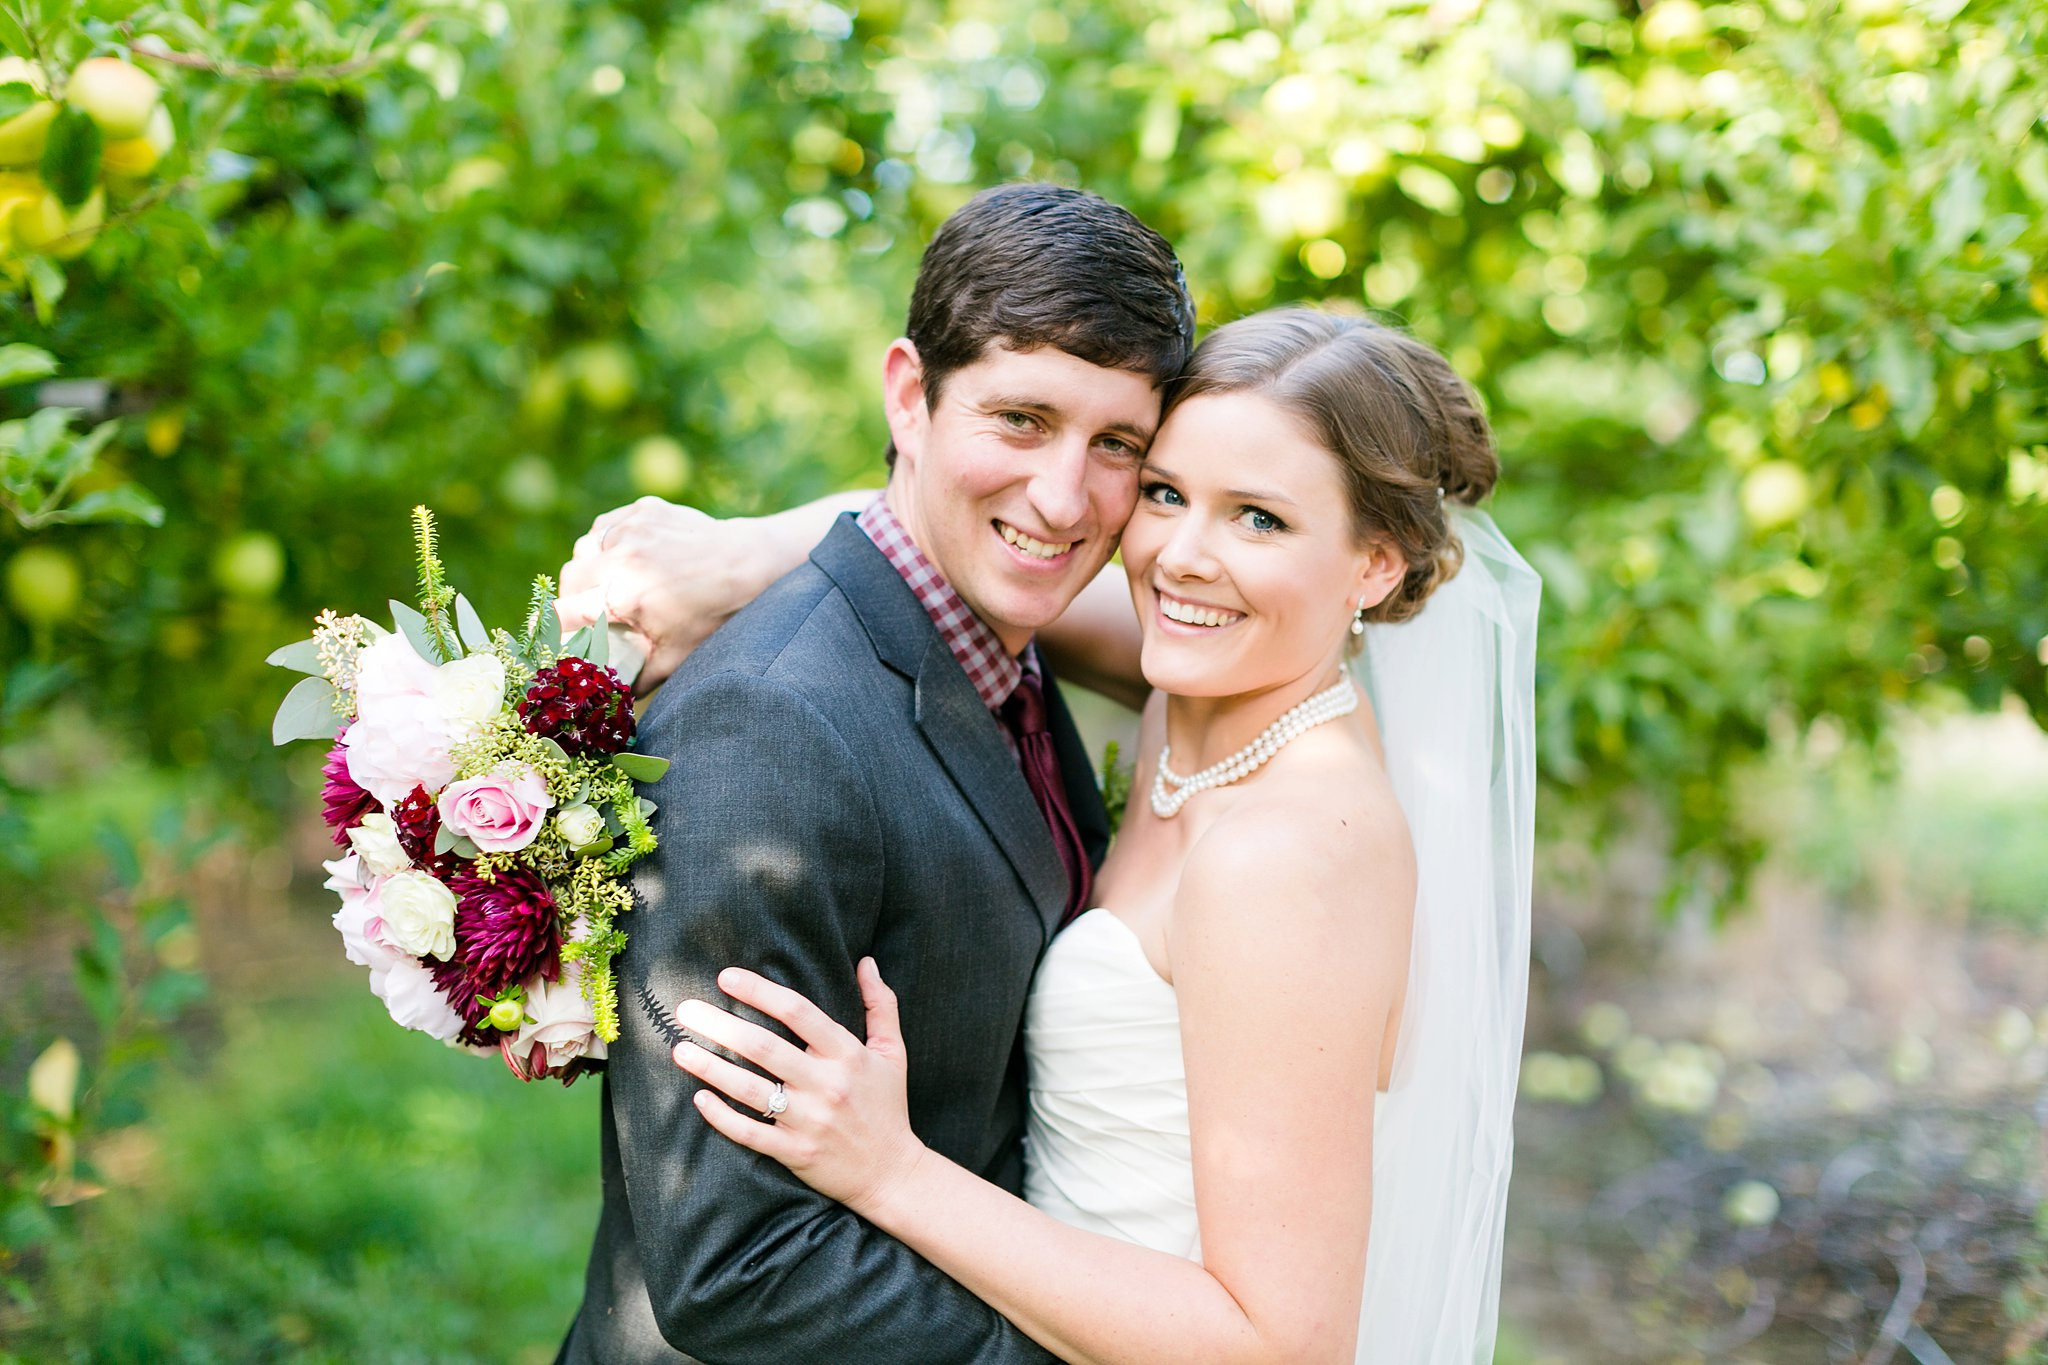 Chelan Washington Wedding Photos Megan Kelsey Photography Delight Wedding Workshop Styled Shoot Annalee & Scot-118.jpg